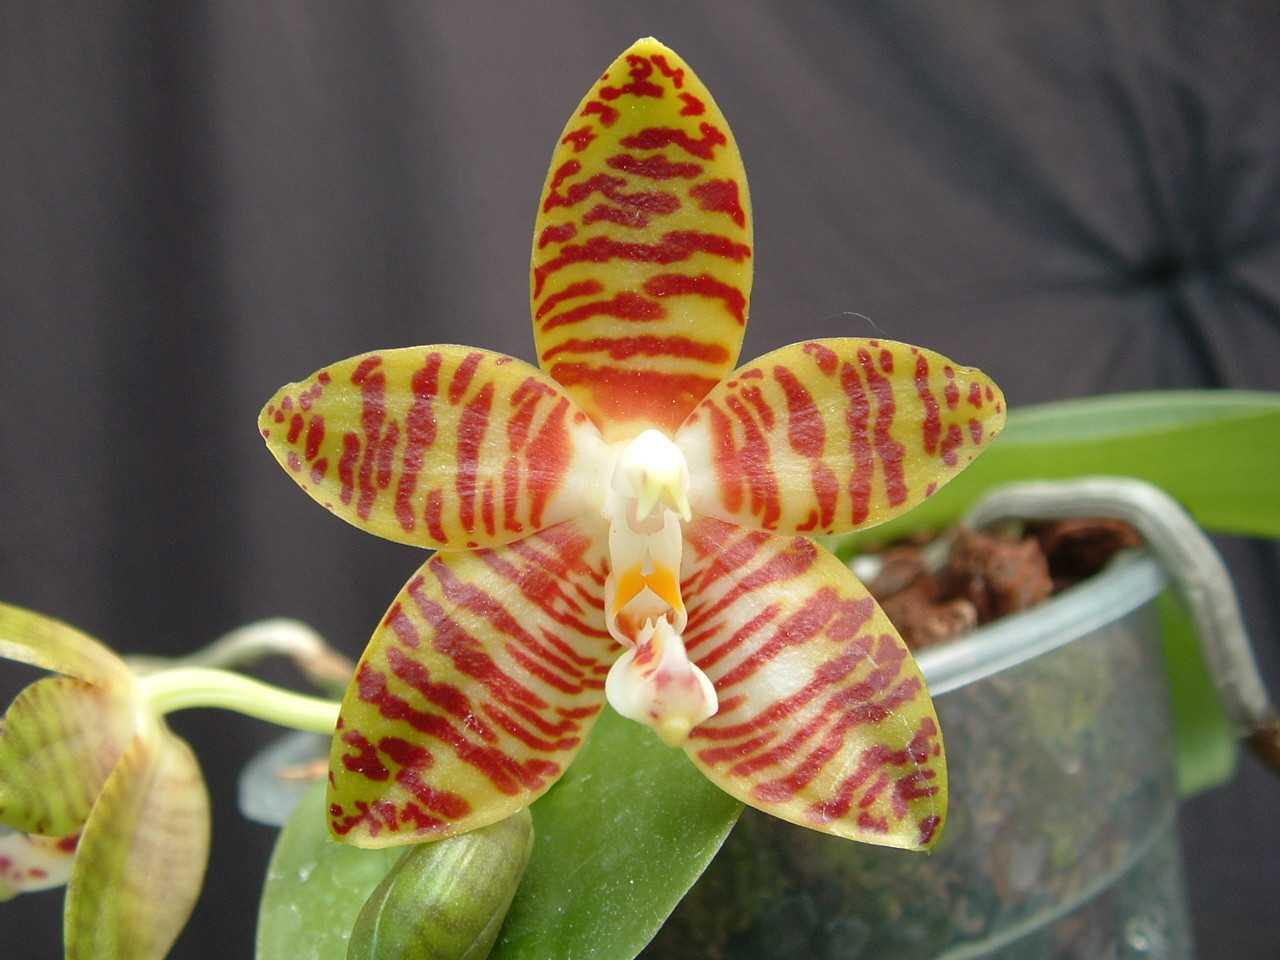 orhideya-falenopsis-foto-video-vidyi-falenopsis-harakteristika-i-opisanie-30